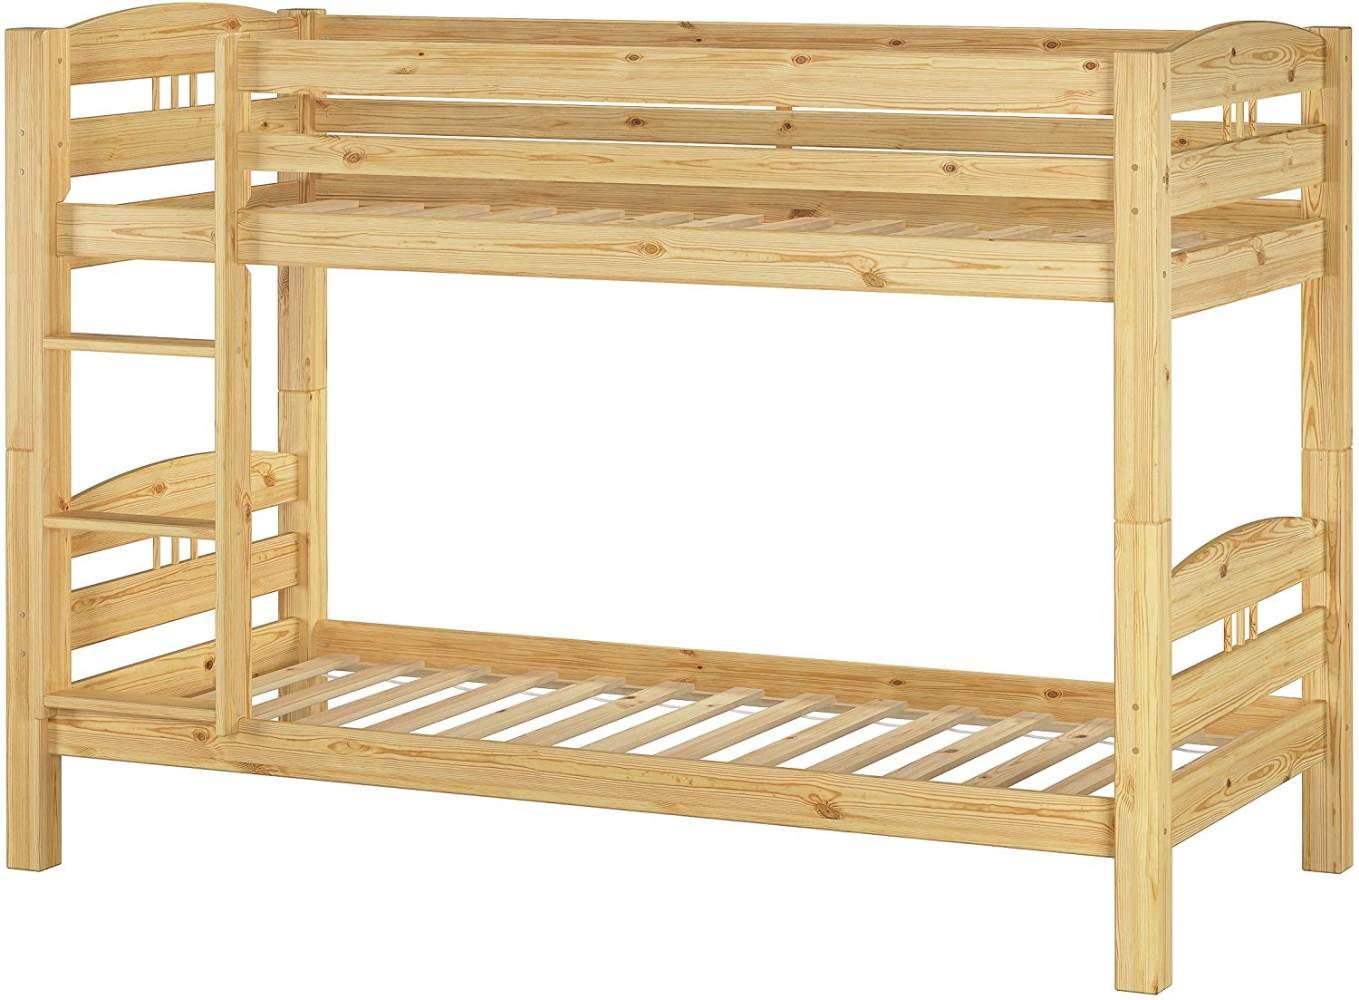 Erst-Holz Etagenbett 90x200 cm, natur, inkl. Rollroste Bild 1